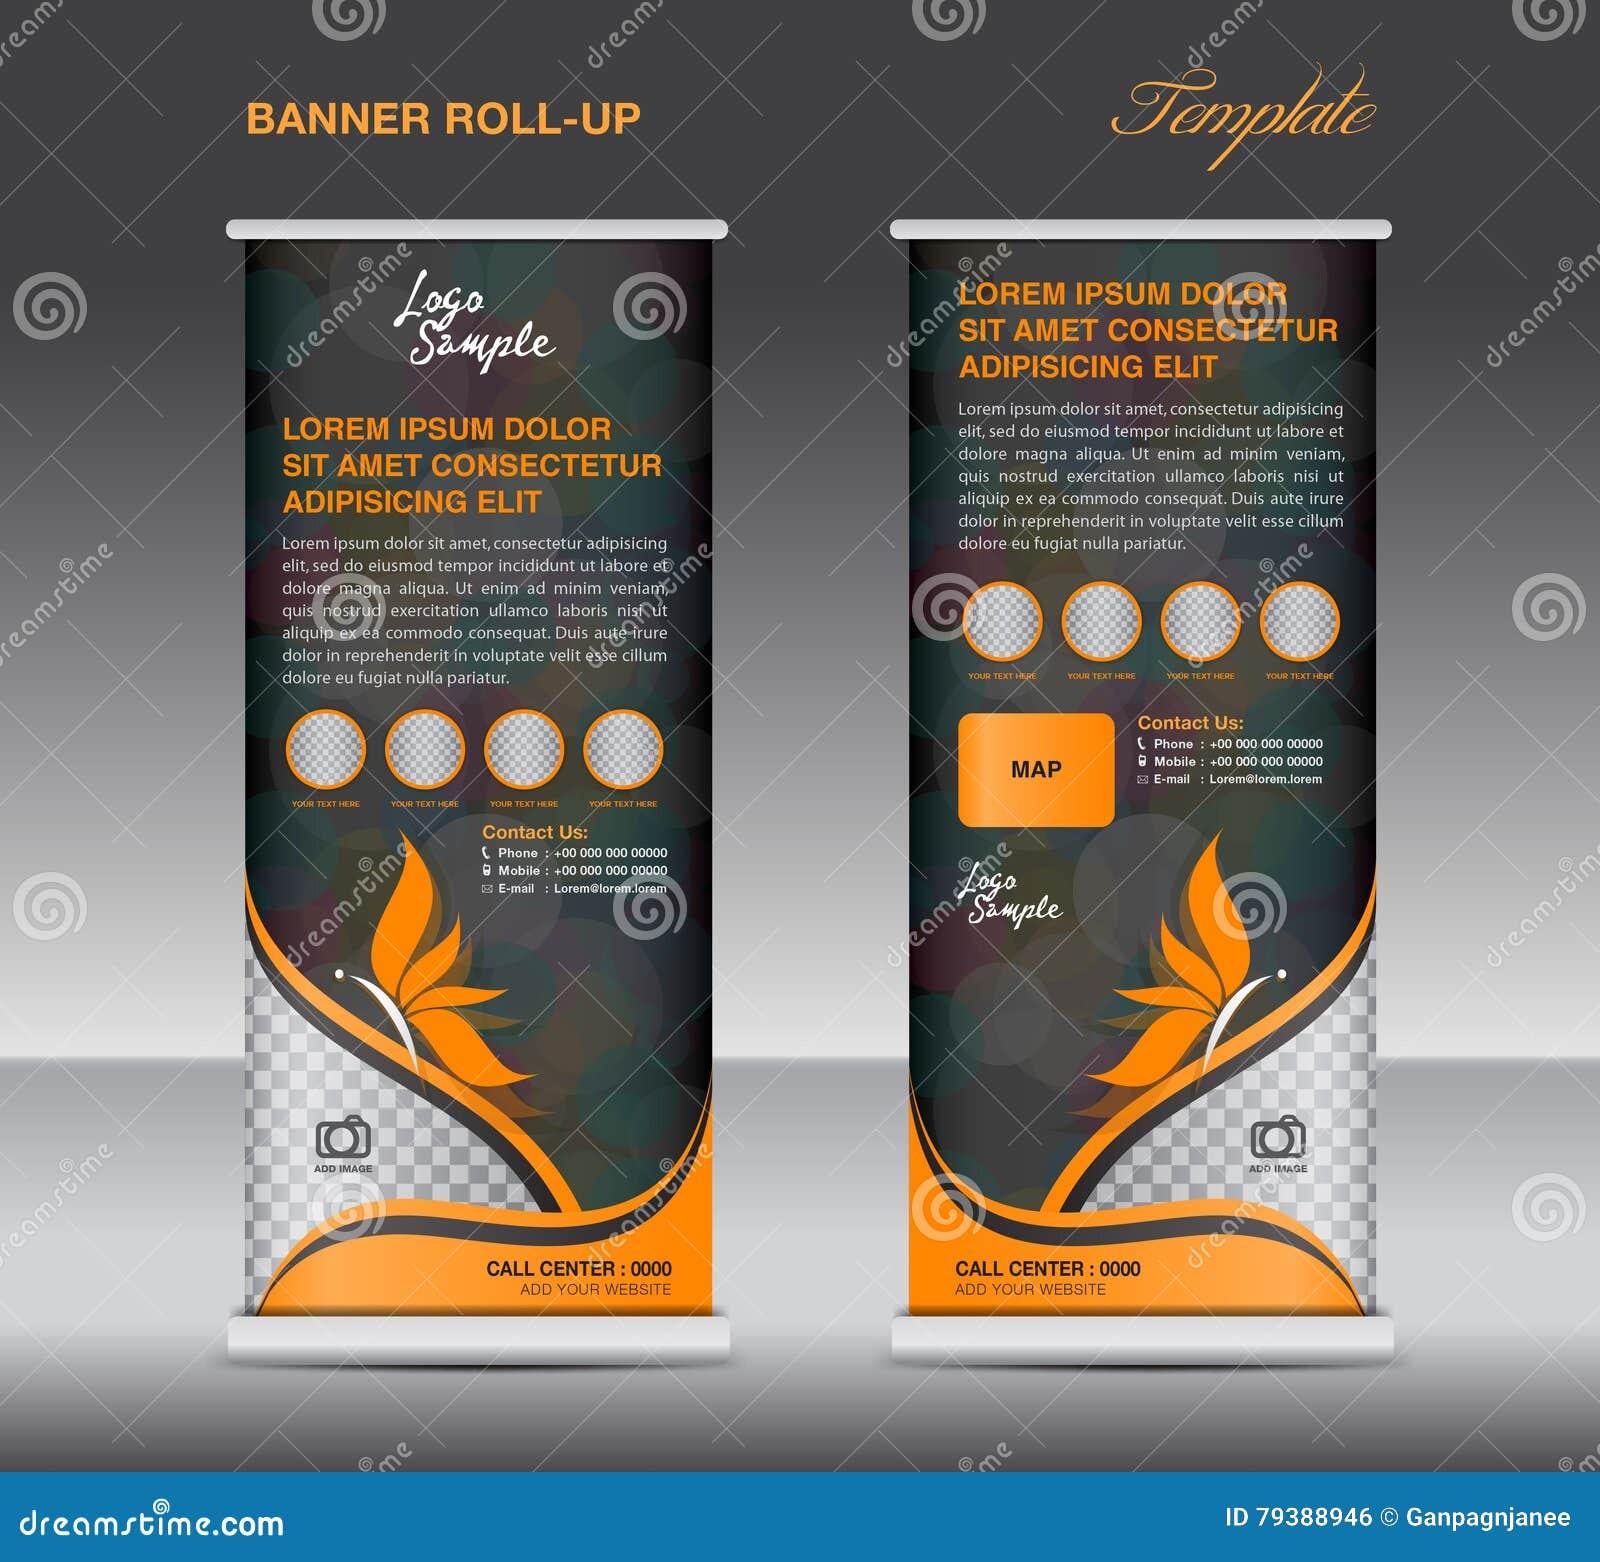 pop up banner design